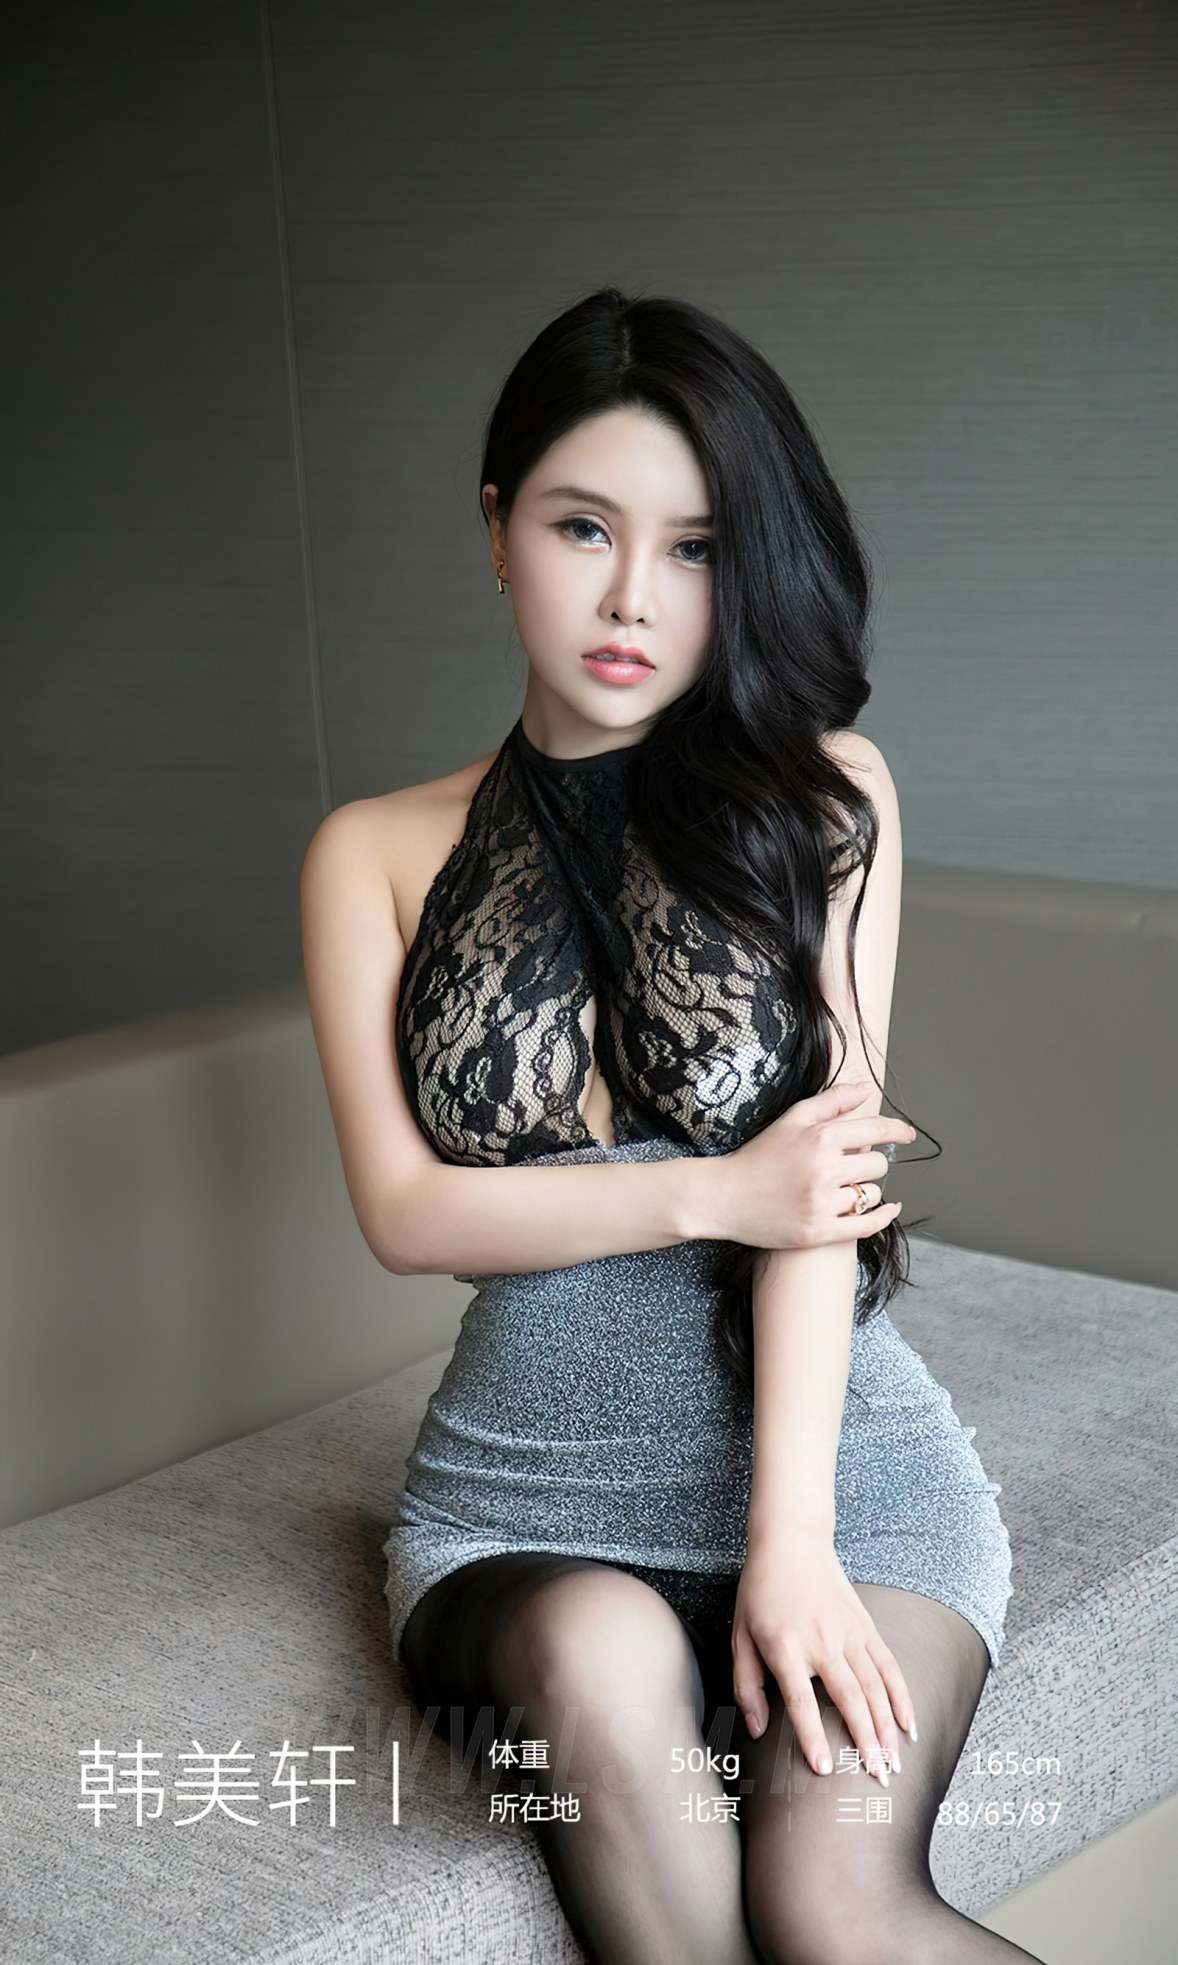 UGirls 爱尤物 No.2168  韩美轩 欲望谷 - 3